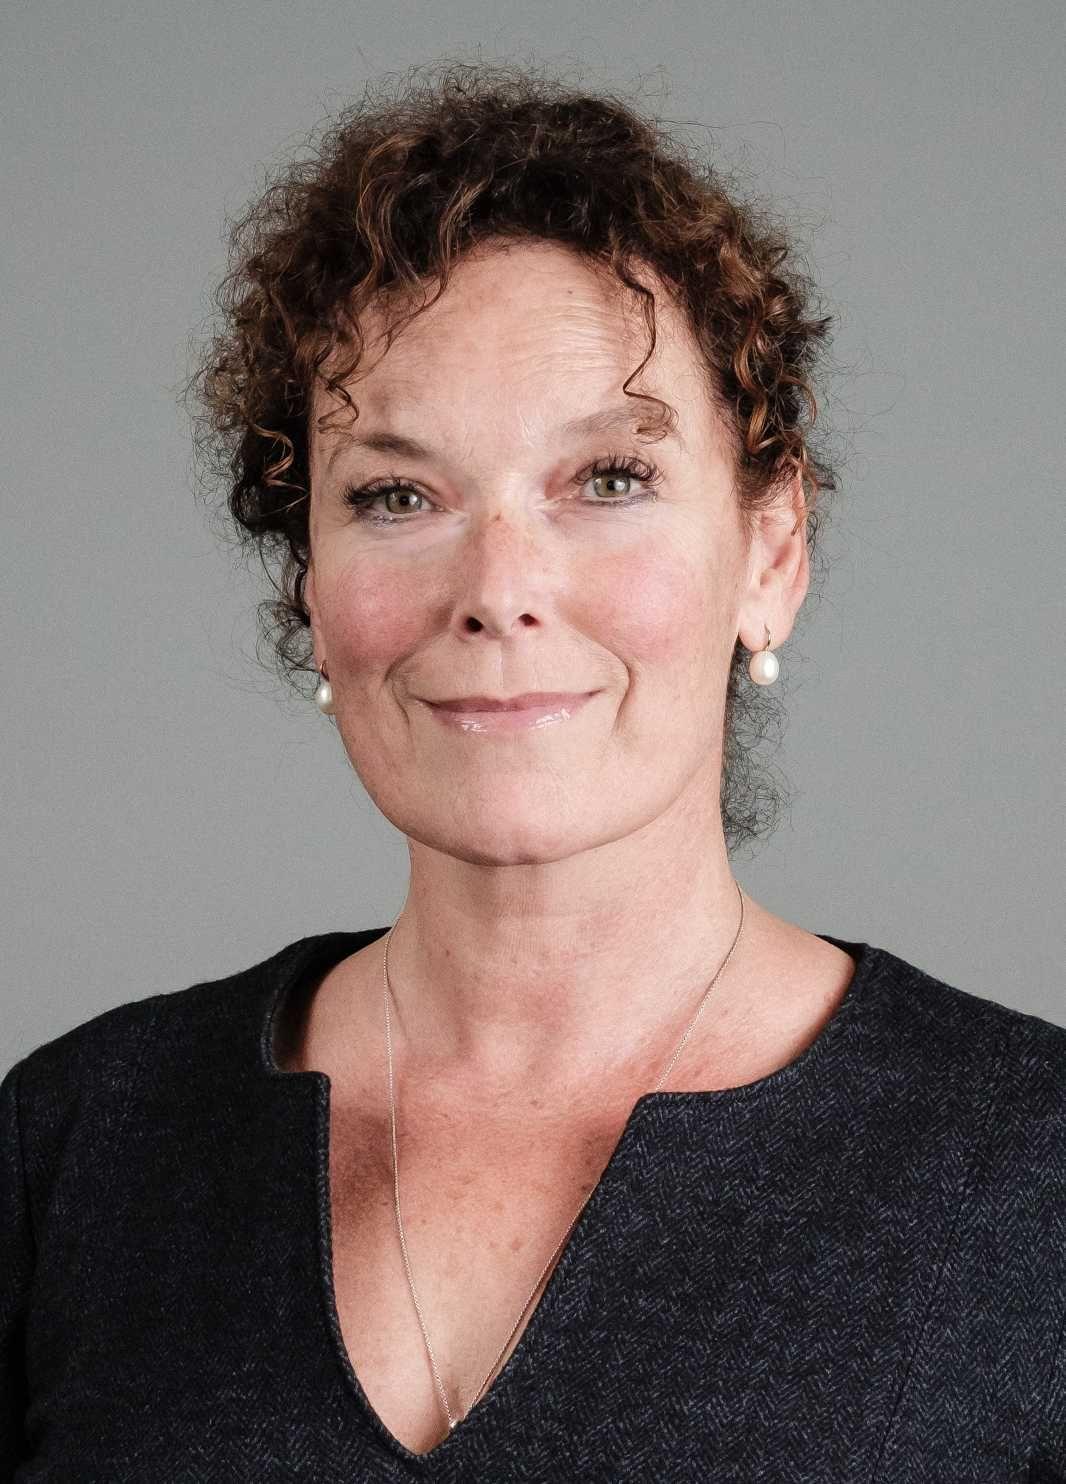 Anja Wenmakers